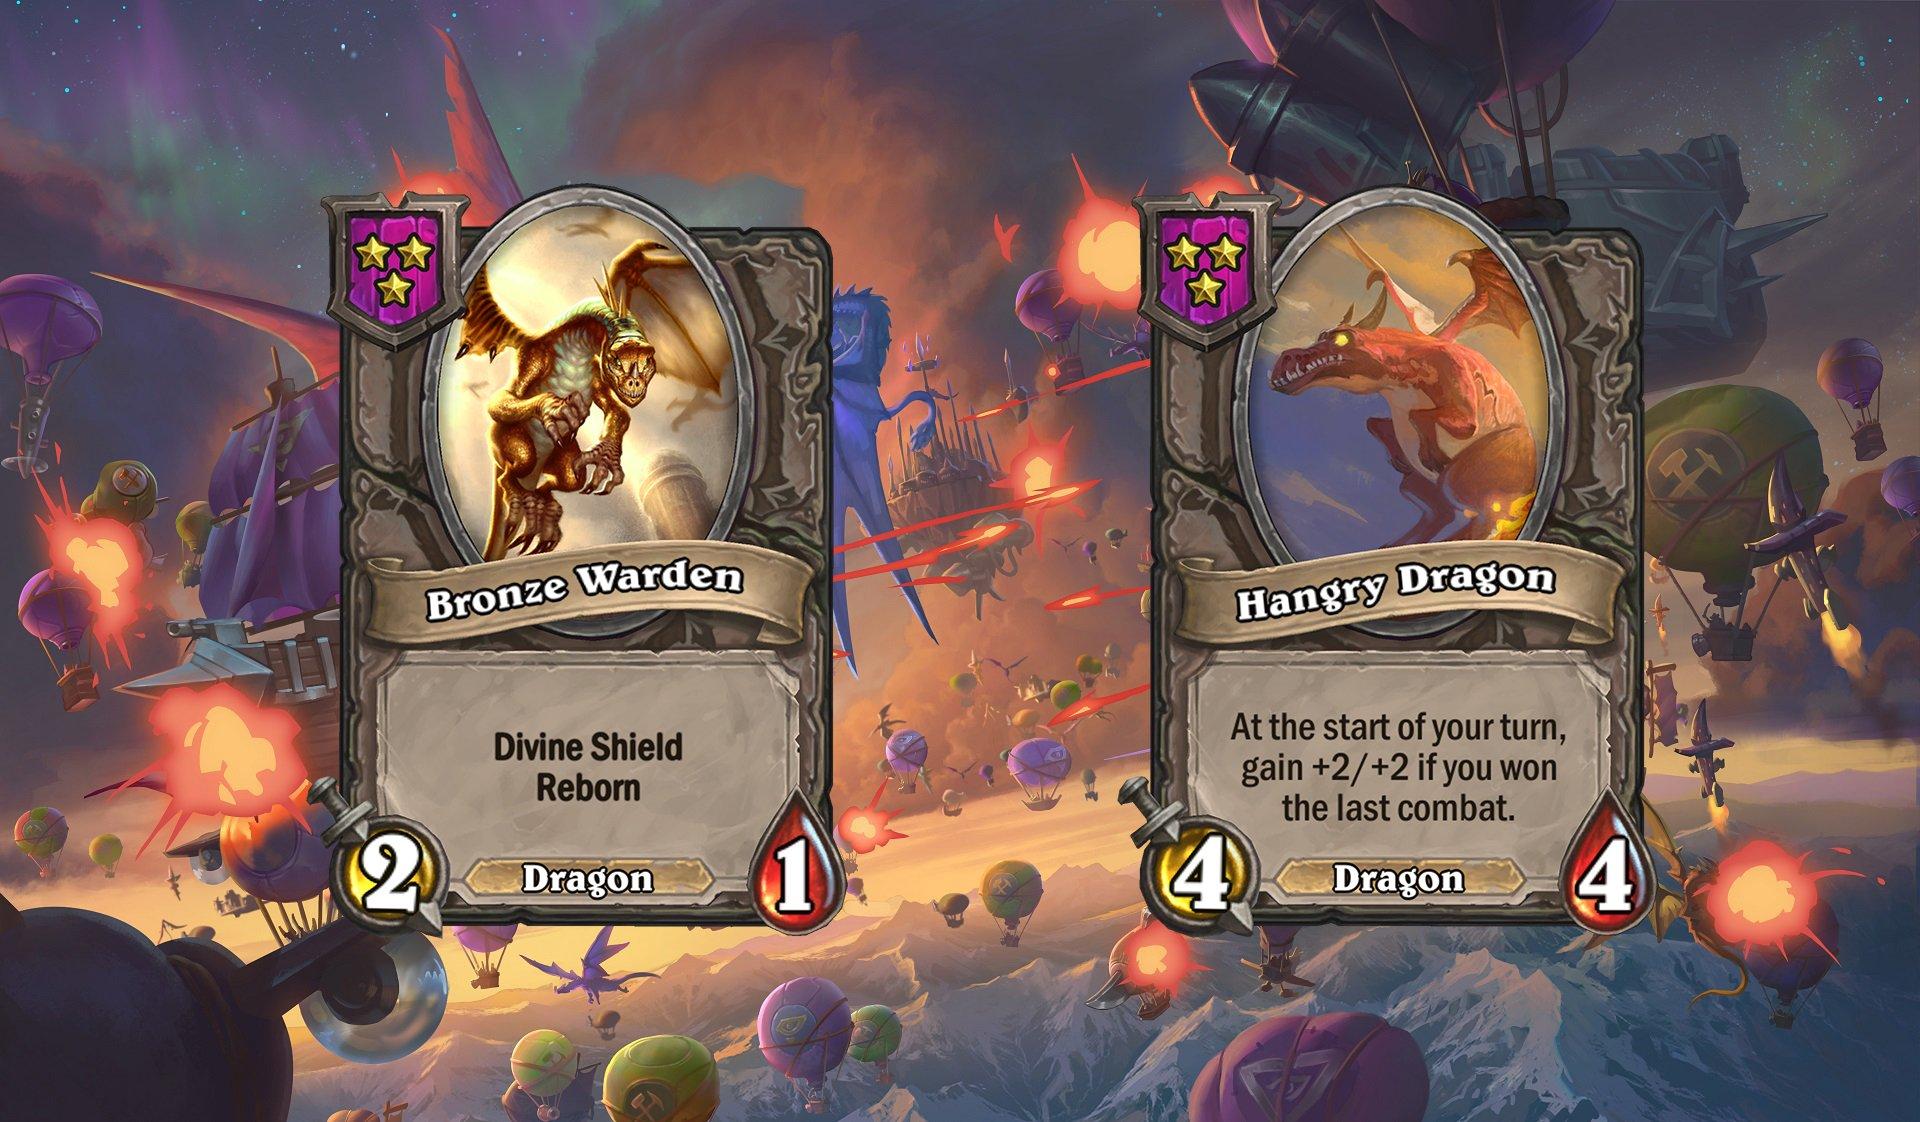 Hearthstone Battlegrounds - Dragons